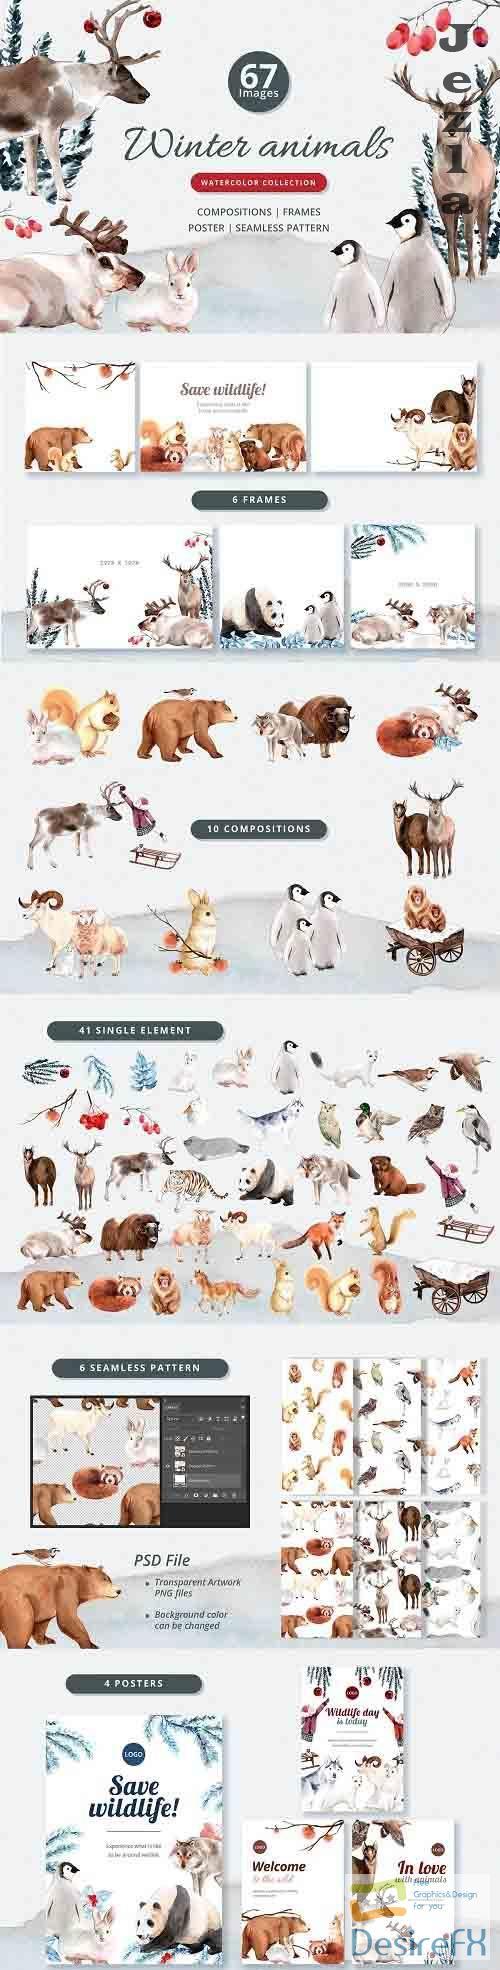 Winter Animals Watercolor - 5636454